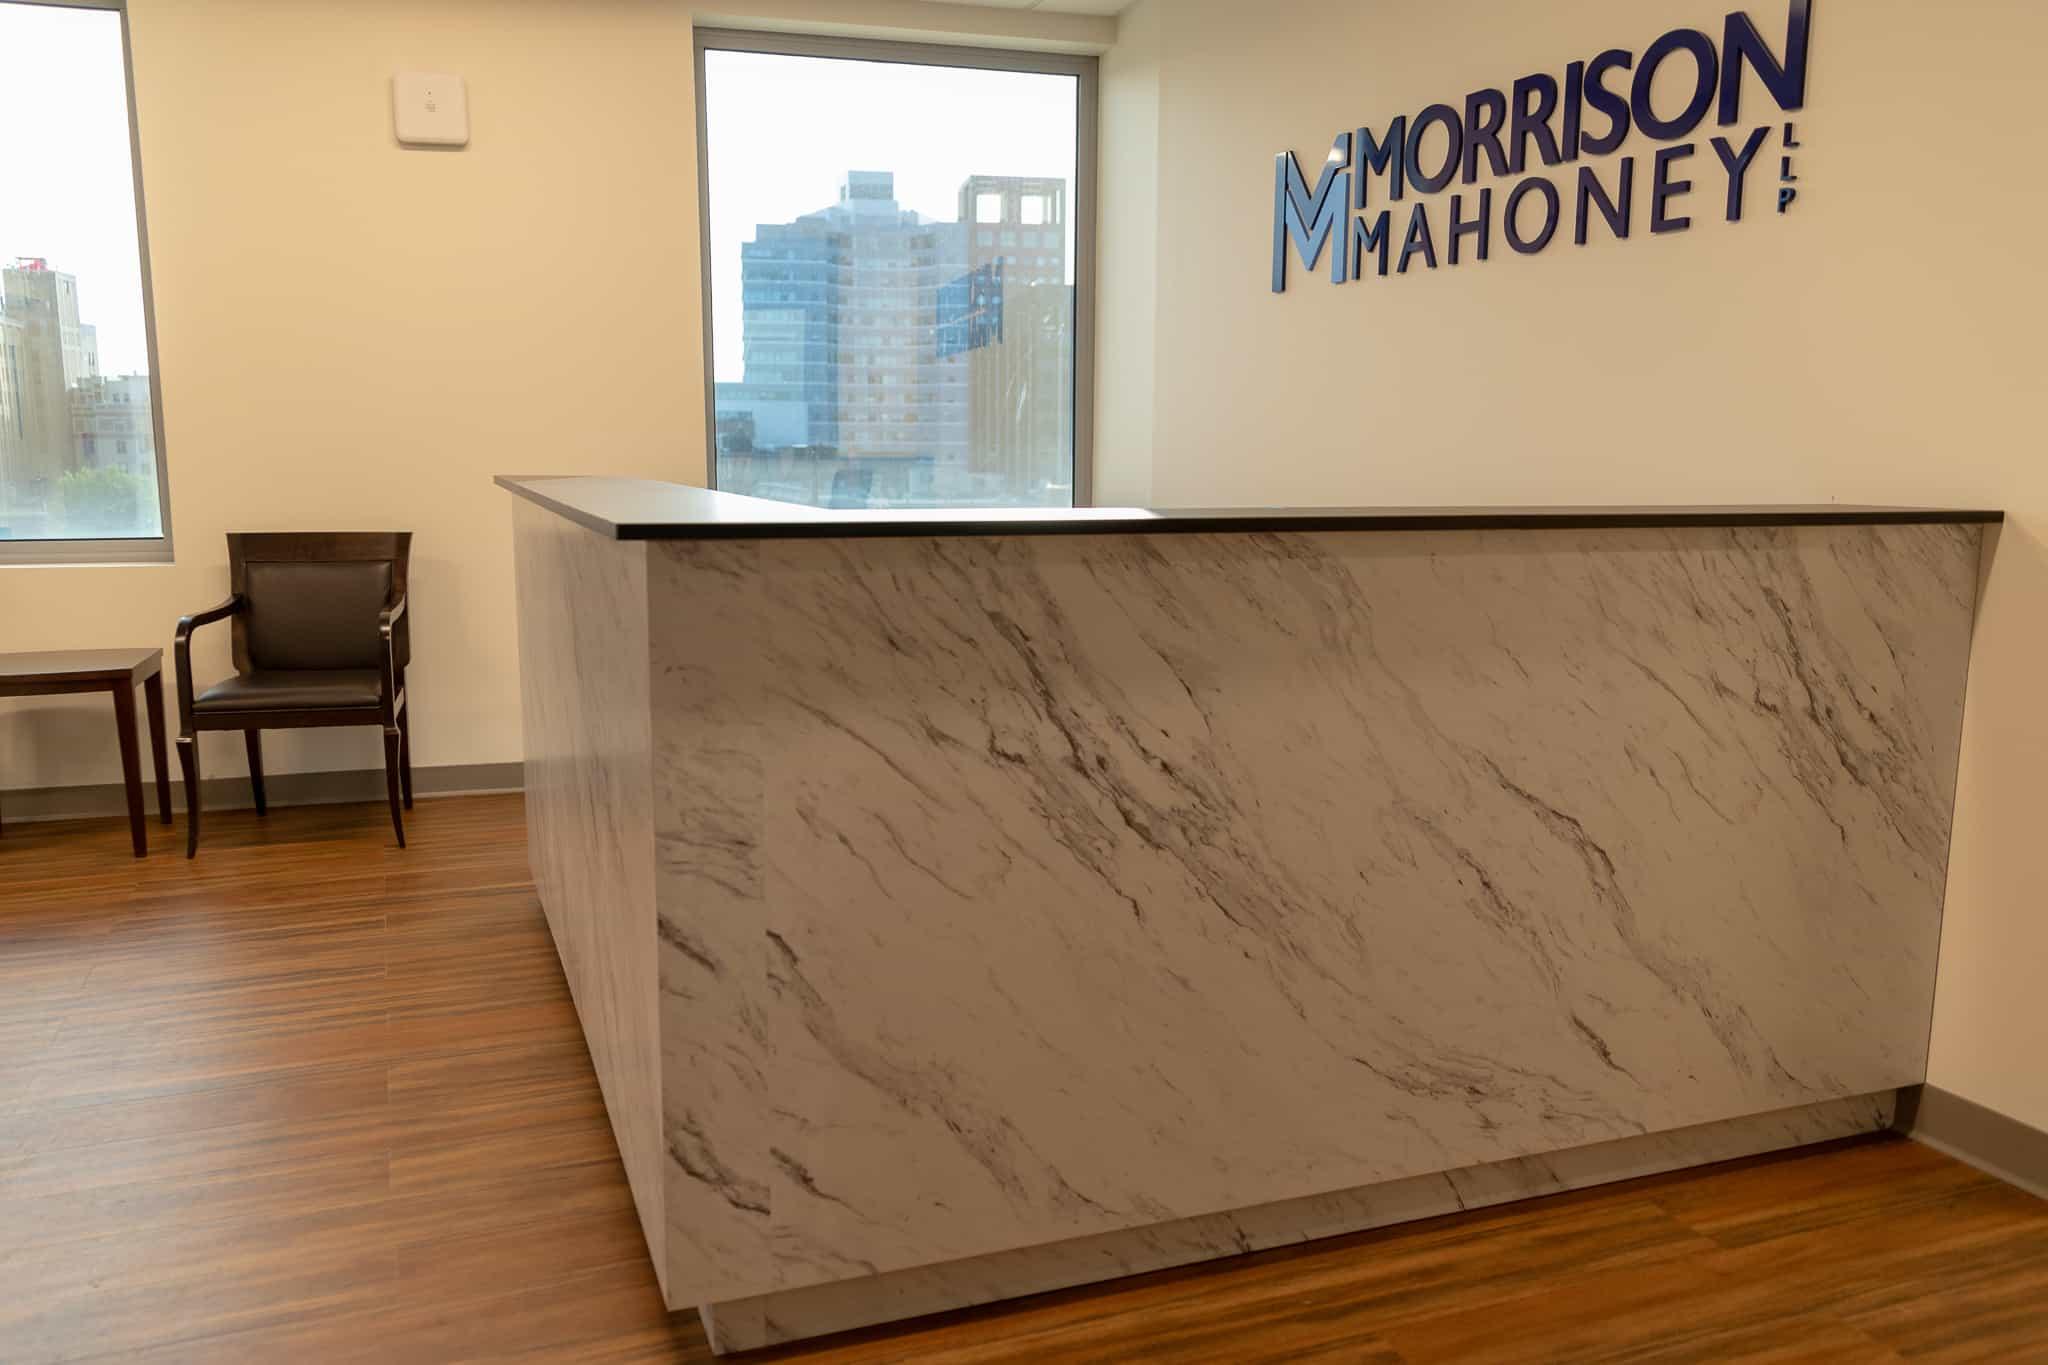 Morrison-Mahoney-1